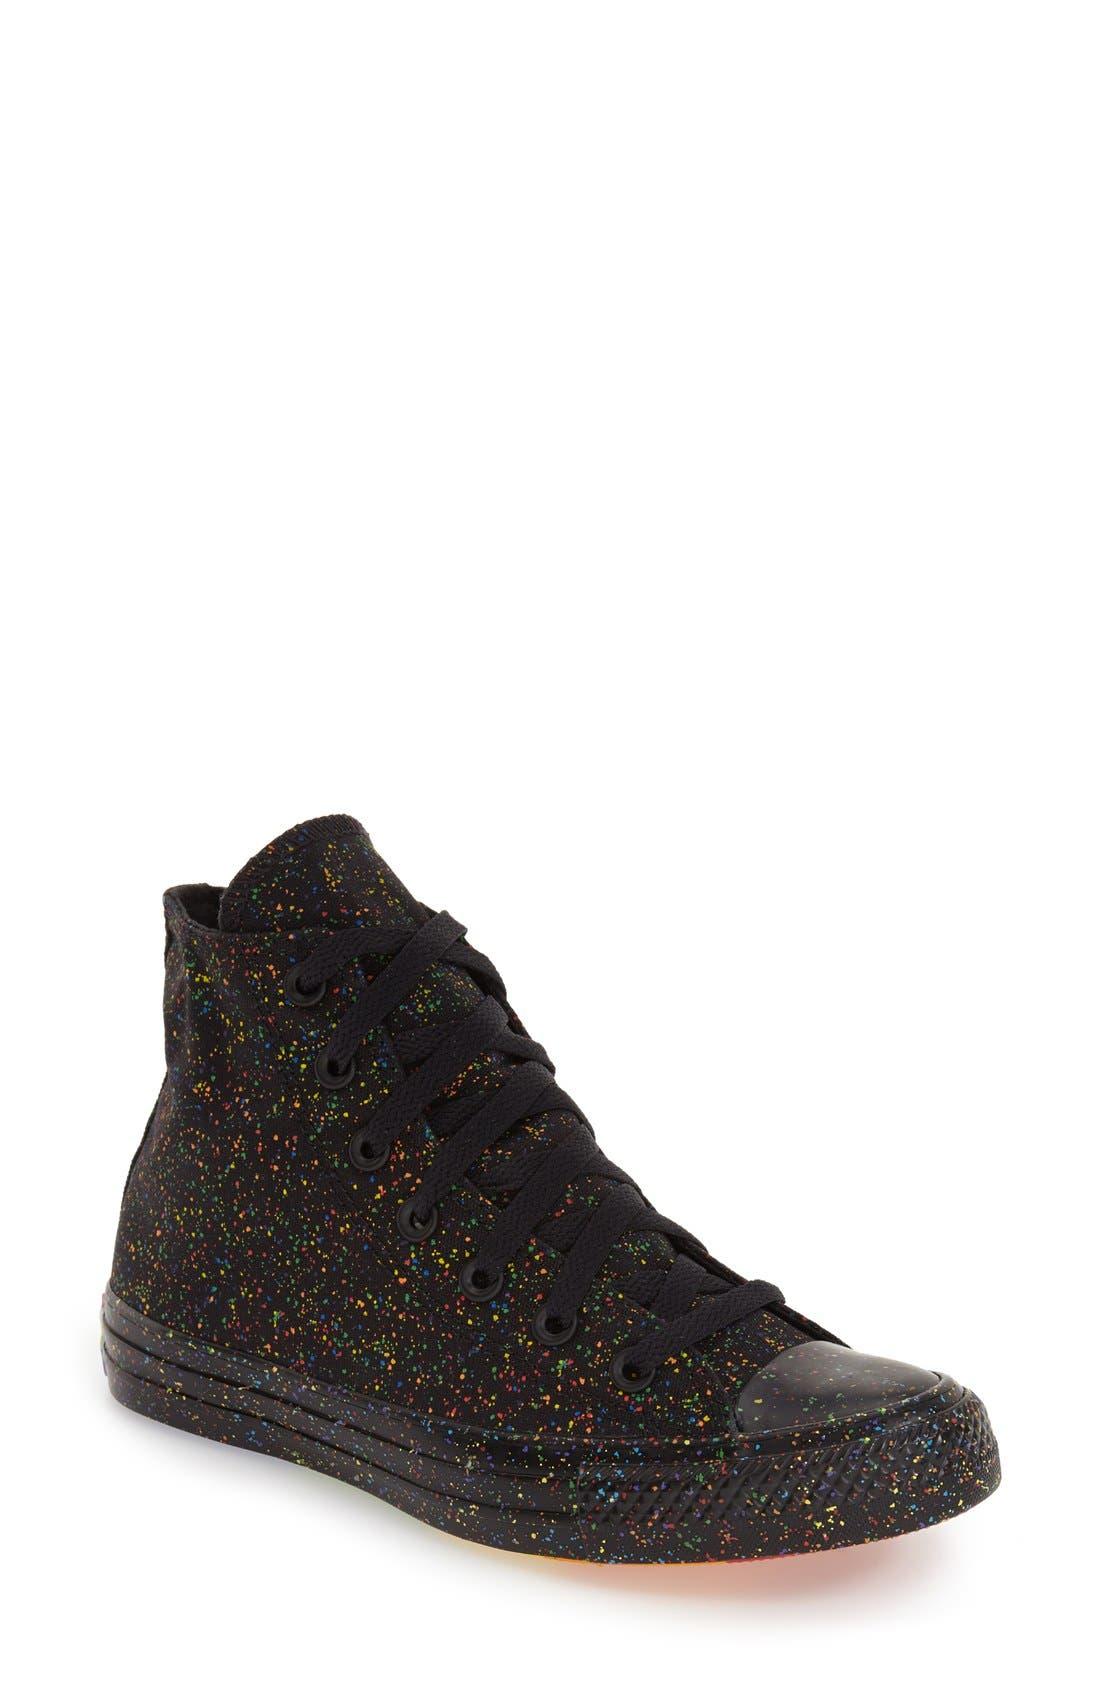 Main Image - Converse Chuck Taylor® All Star® 'Pride' High Top Sneaker (Women)